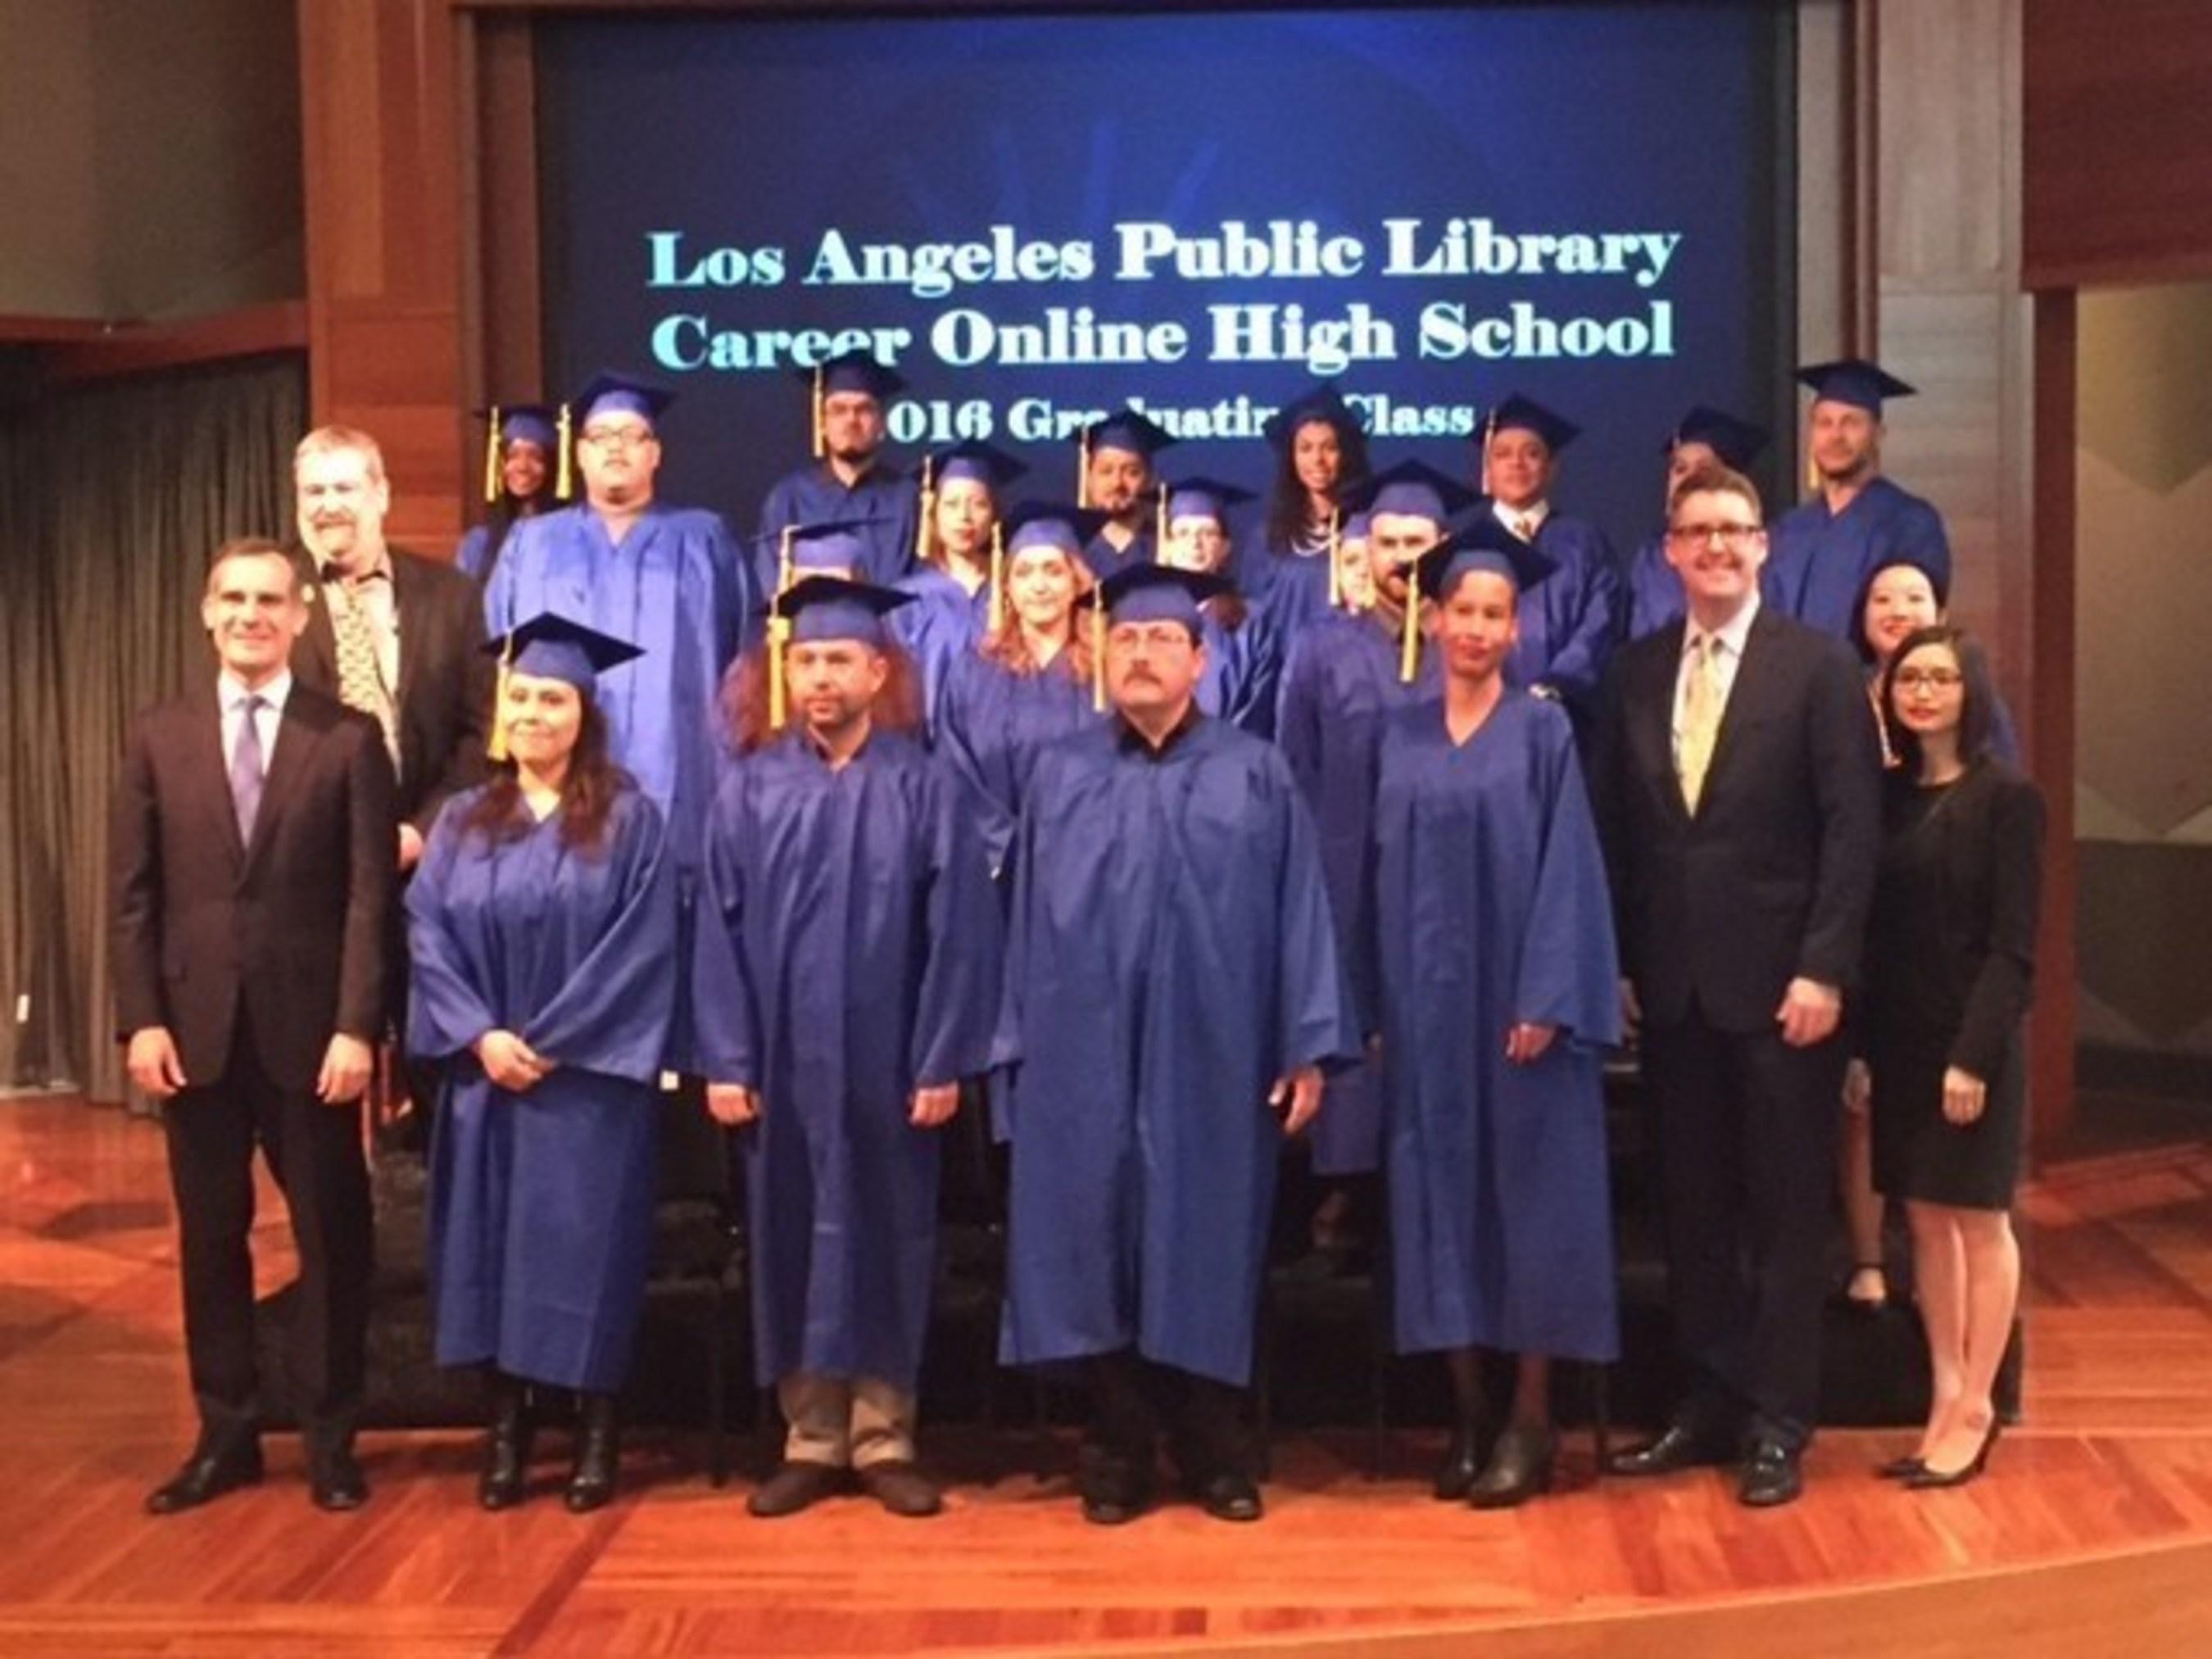 First Graduating Class Receives Diplomas and Career Certificates through Innovative Program at Los